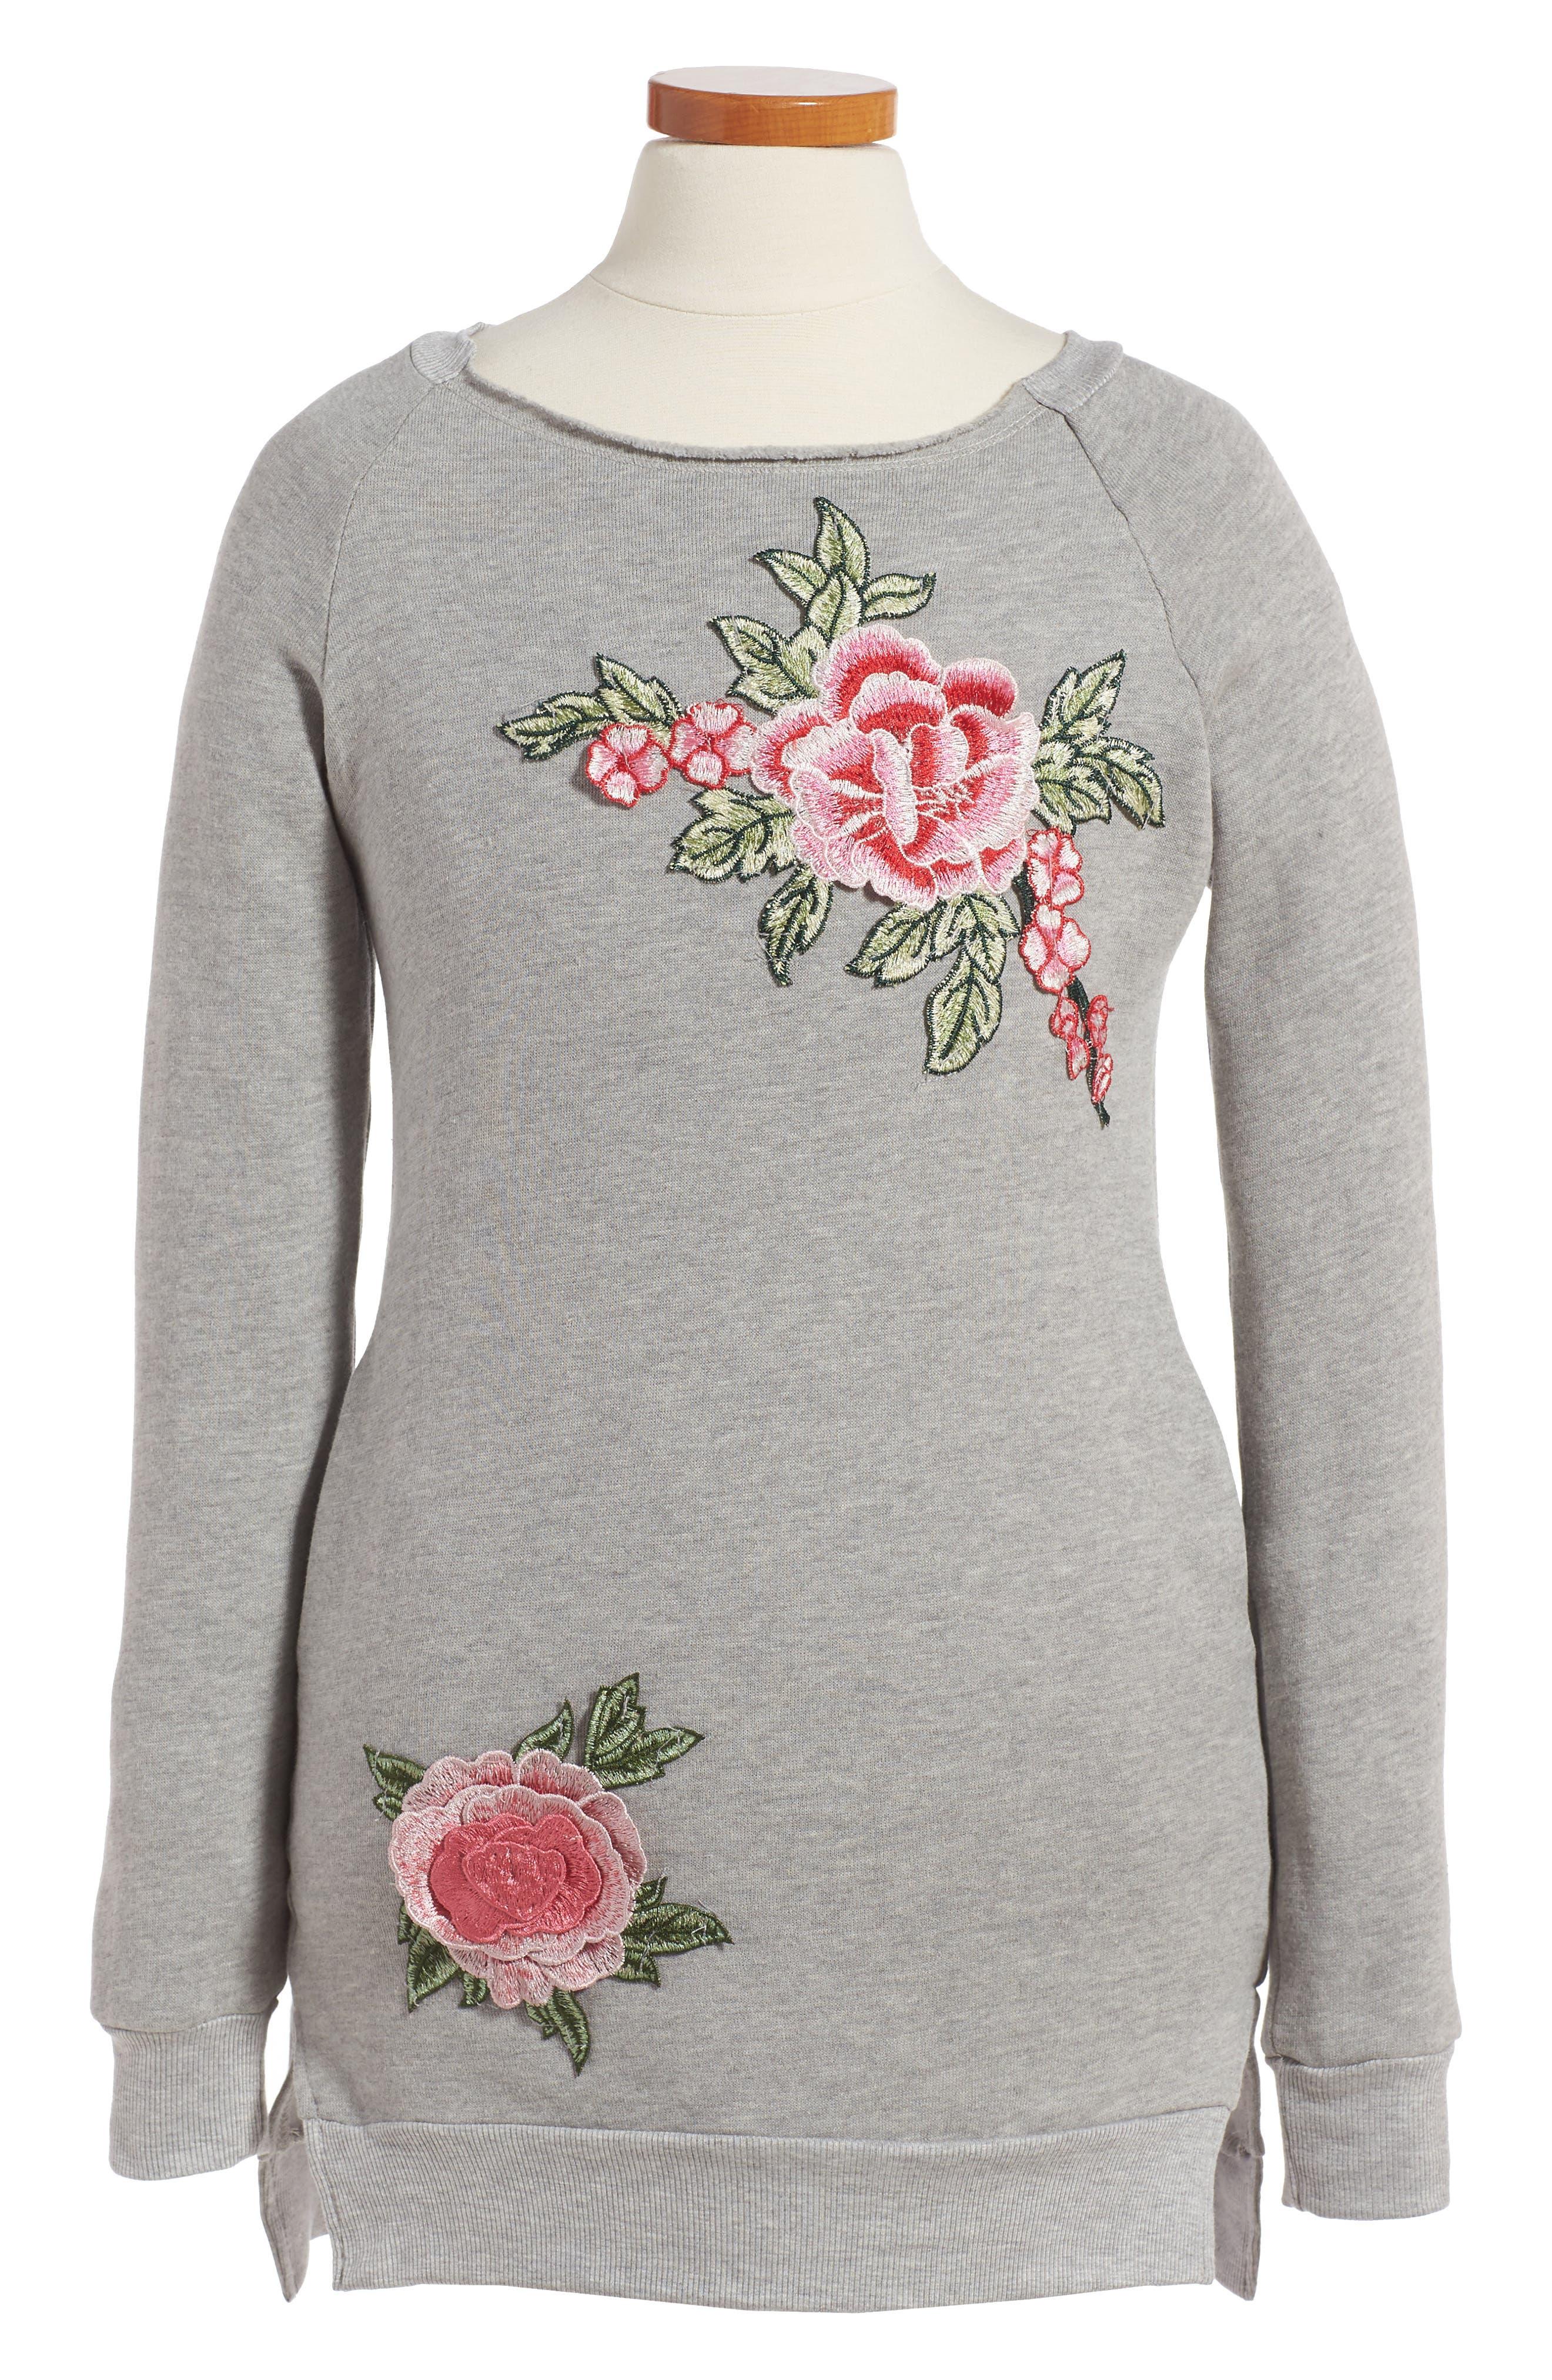 Main Image - PPLA Dreamer Appliqué Sweatshirt Dress (Big Girls)